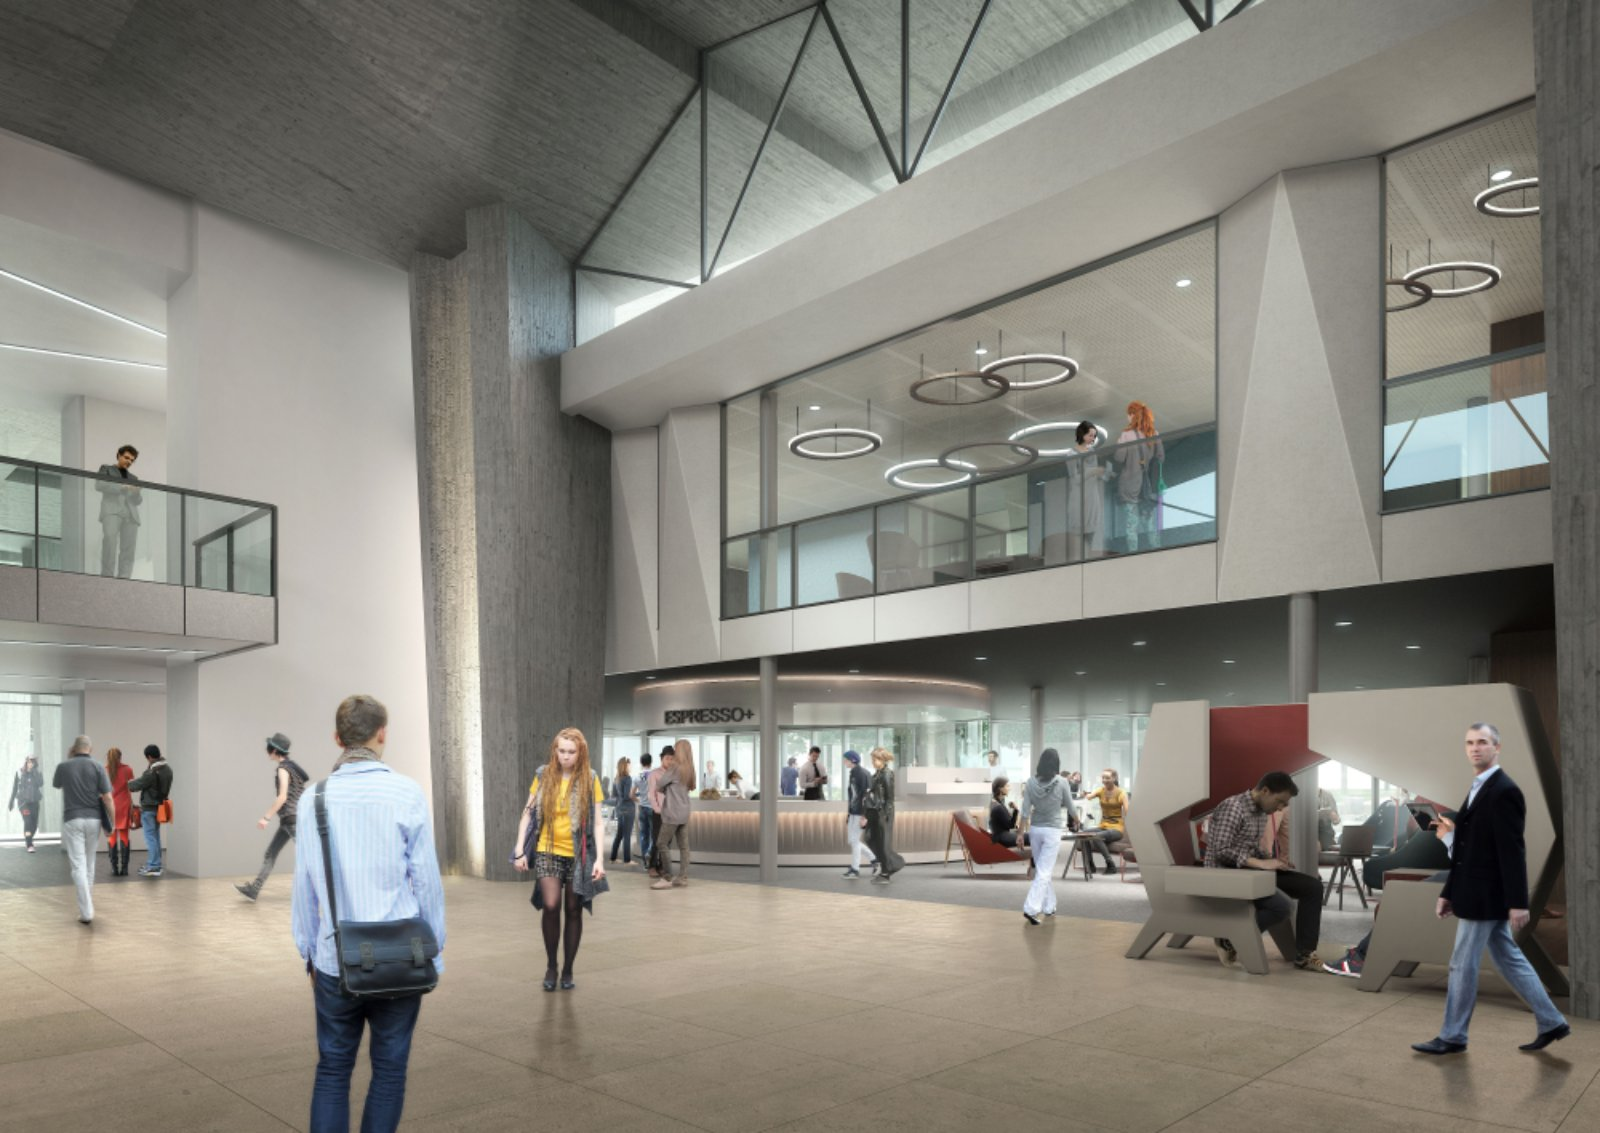 Main Building Eindhoven University